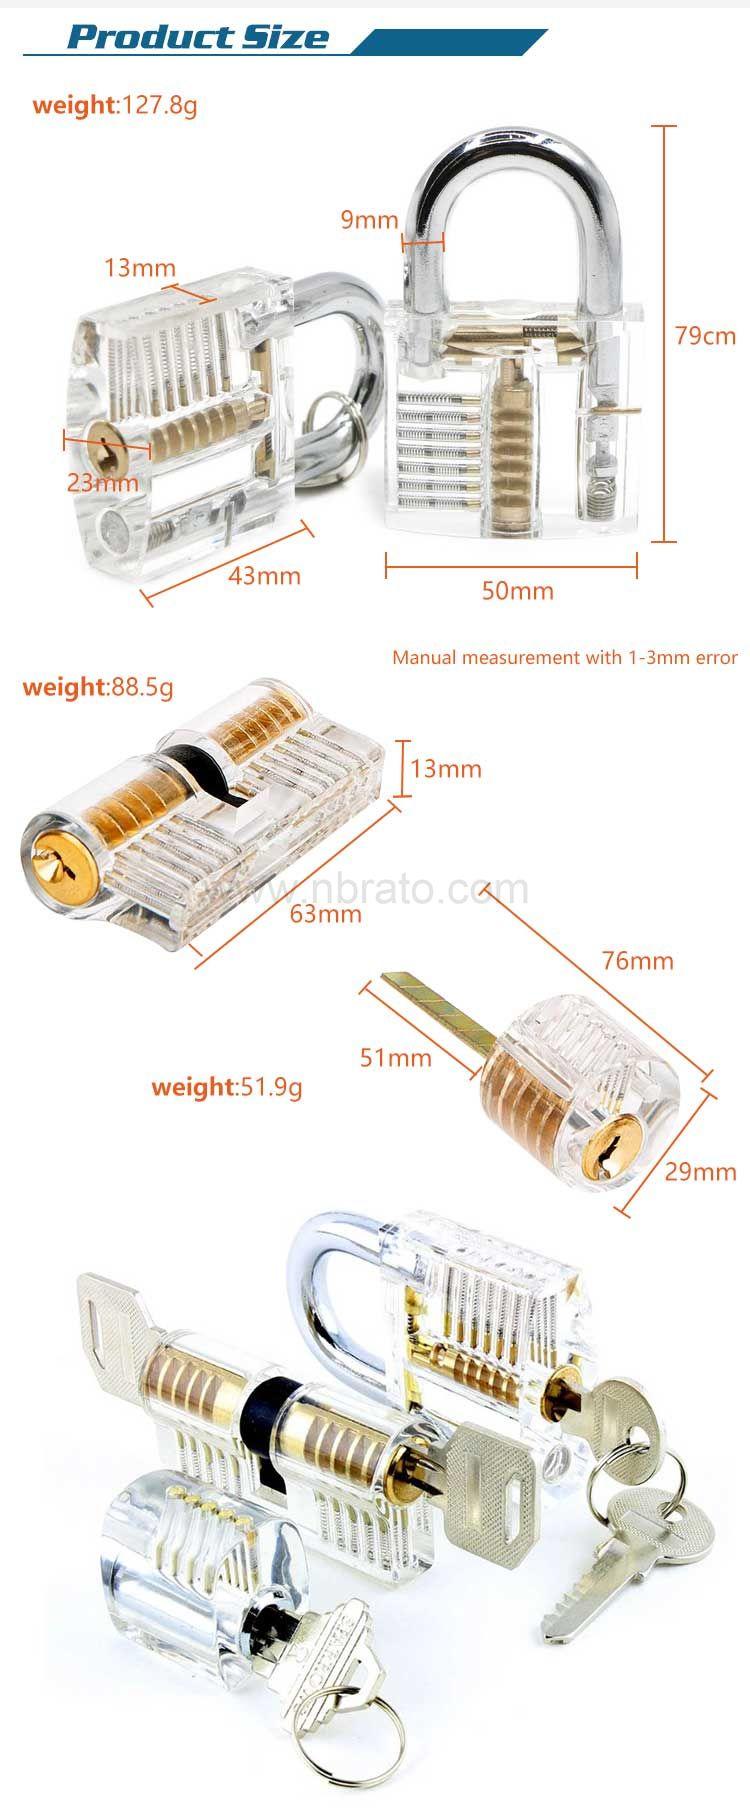 Stainless steel lock pick set 24PCS with 2 pcs transparent practice lock